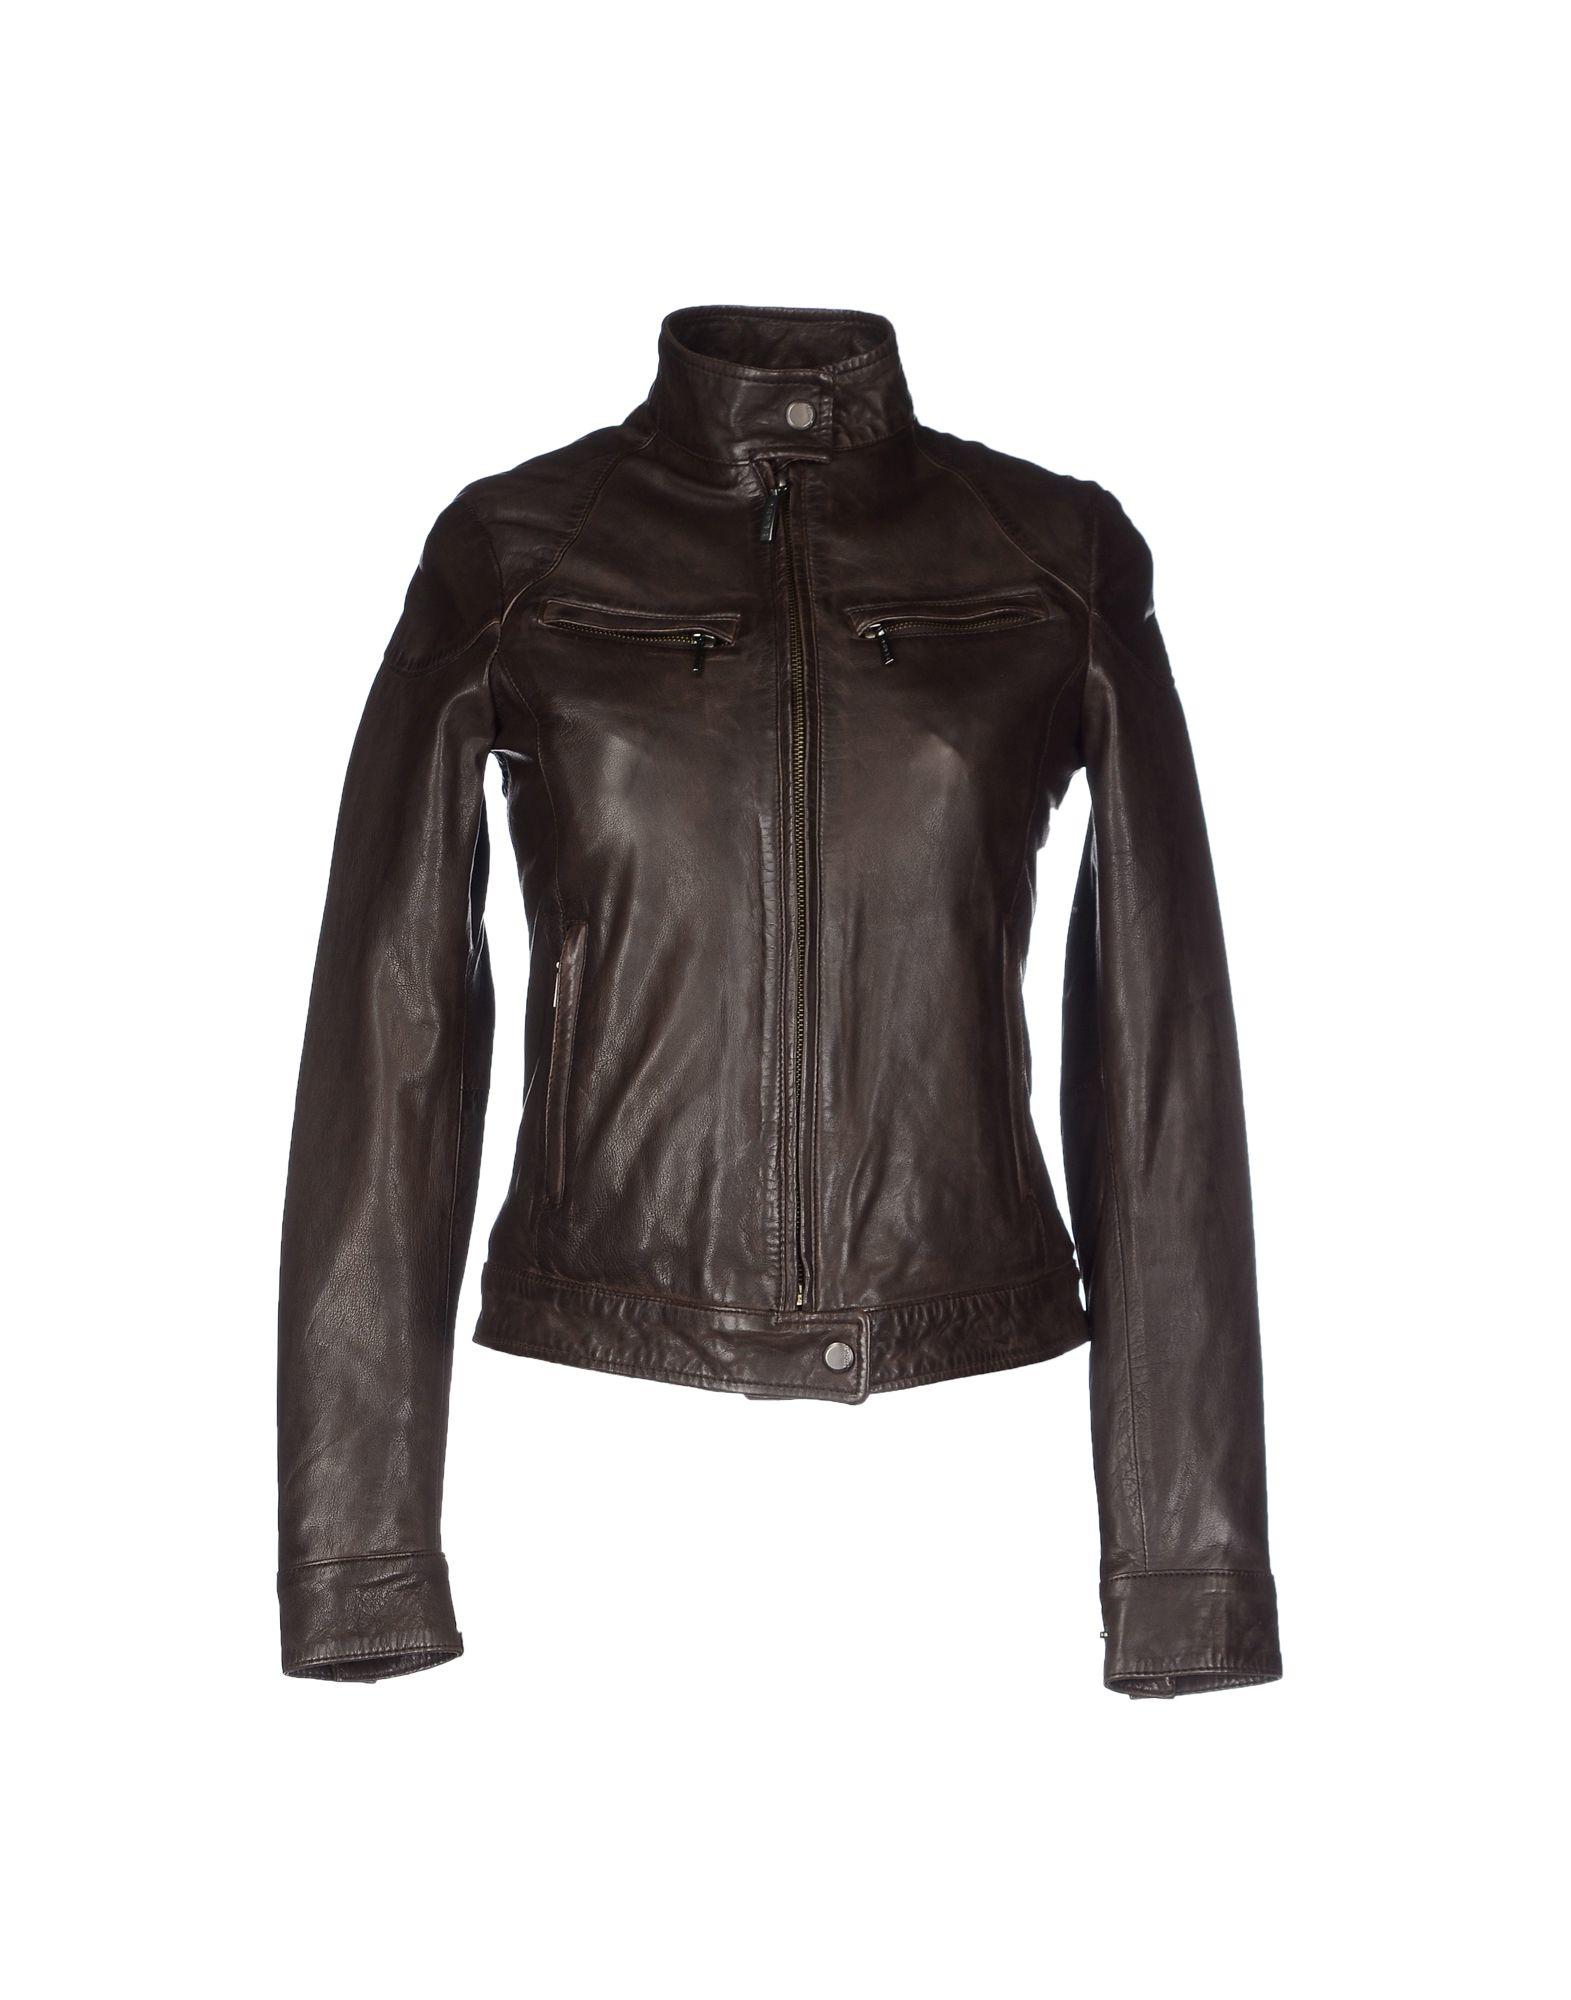 Brema Jacket in Brown